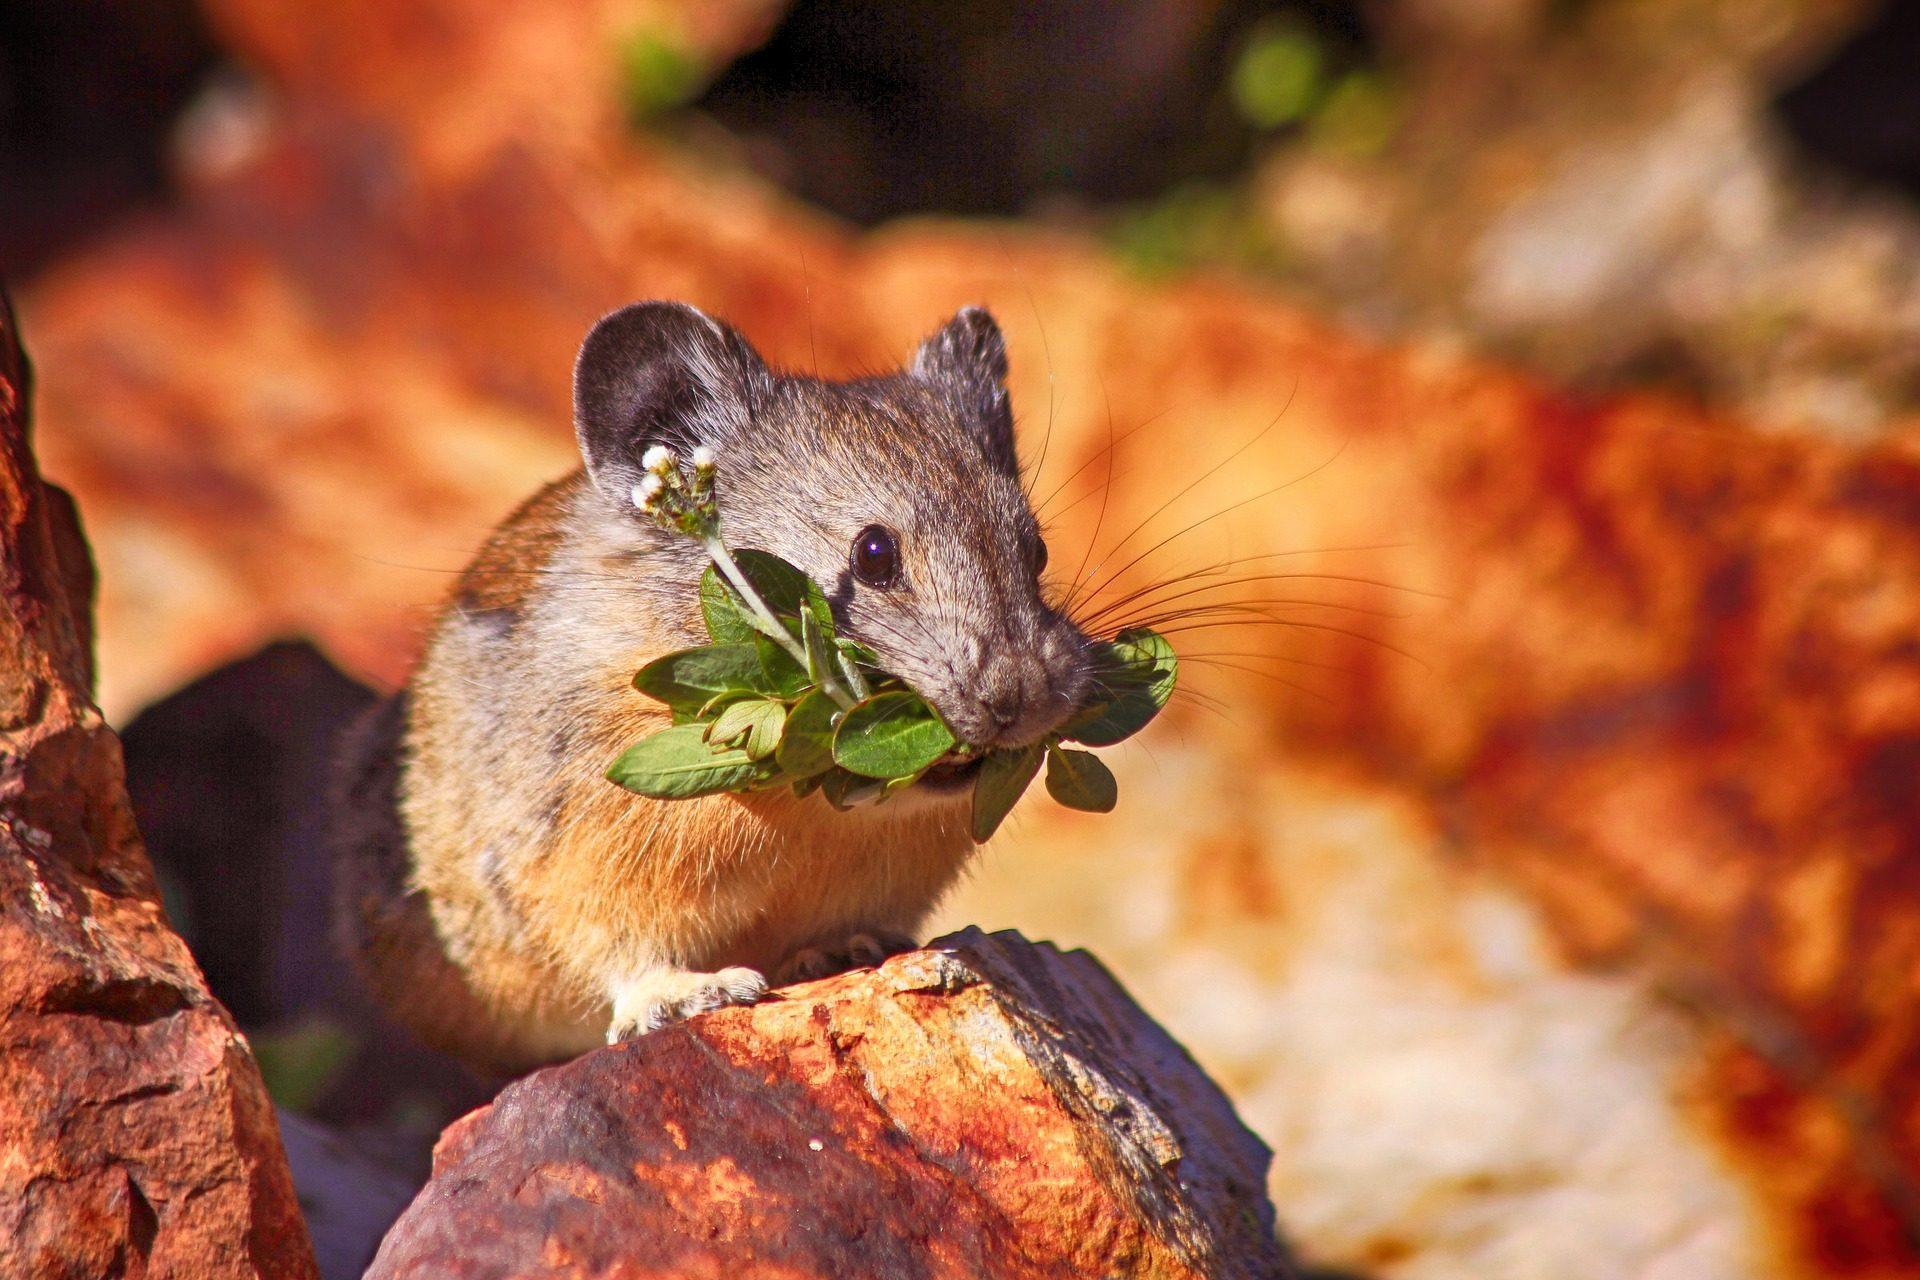 rato, Hamster, Ramos, comida, roedor - Papéis de parede HD - Professor-falken.com